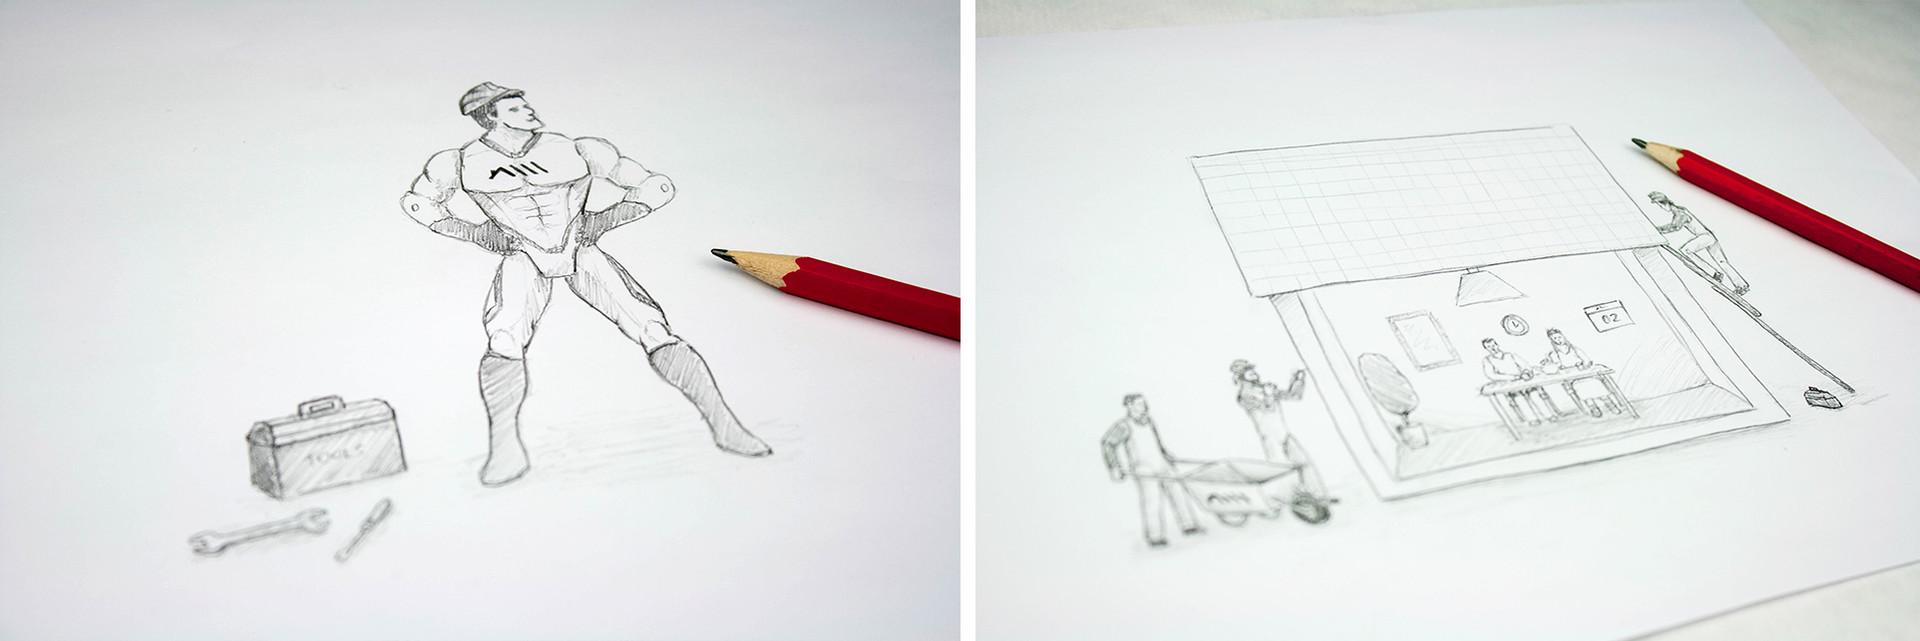 warwick sketch.jpg